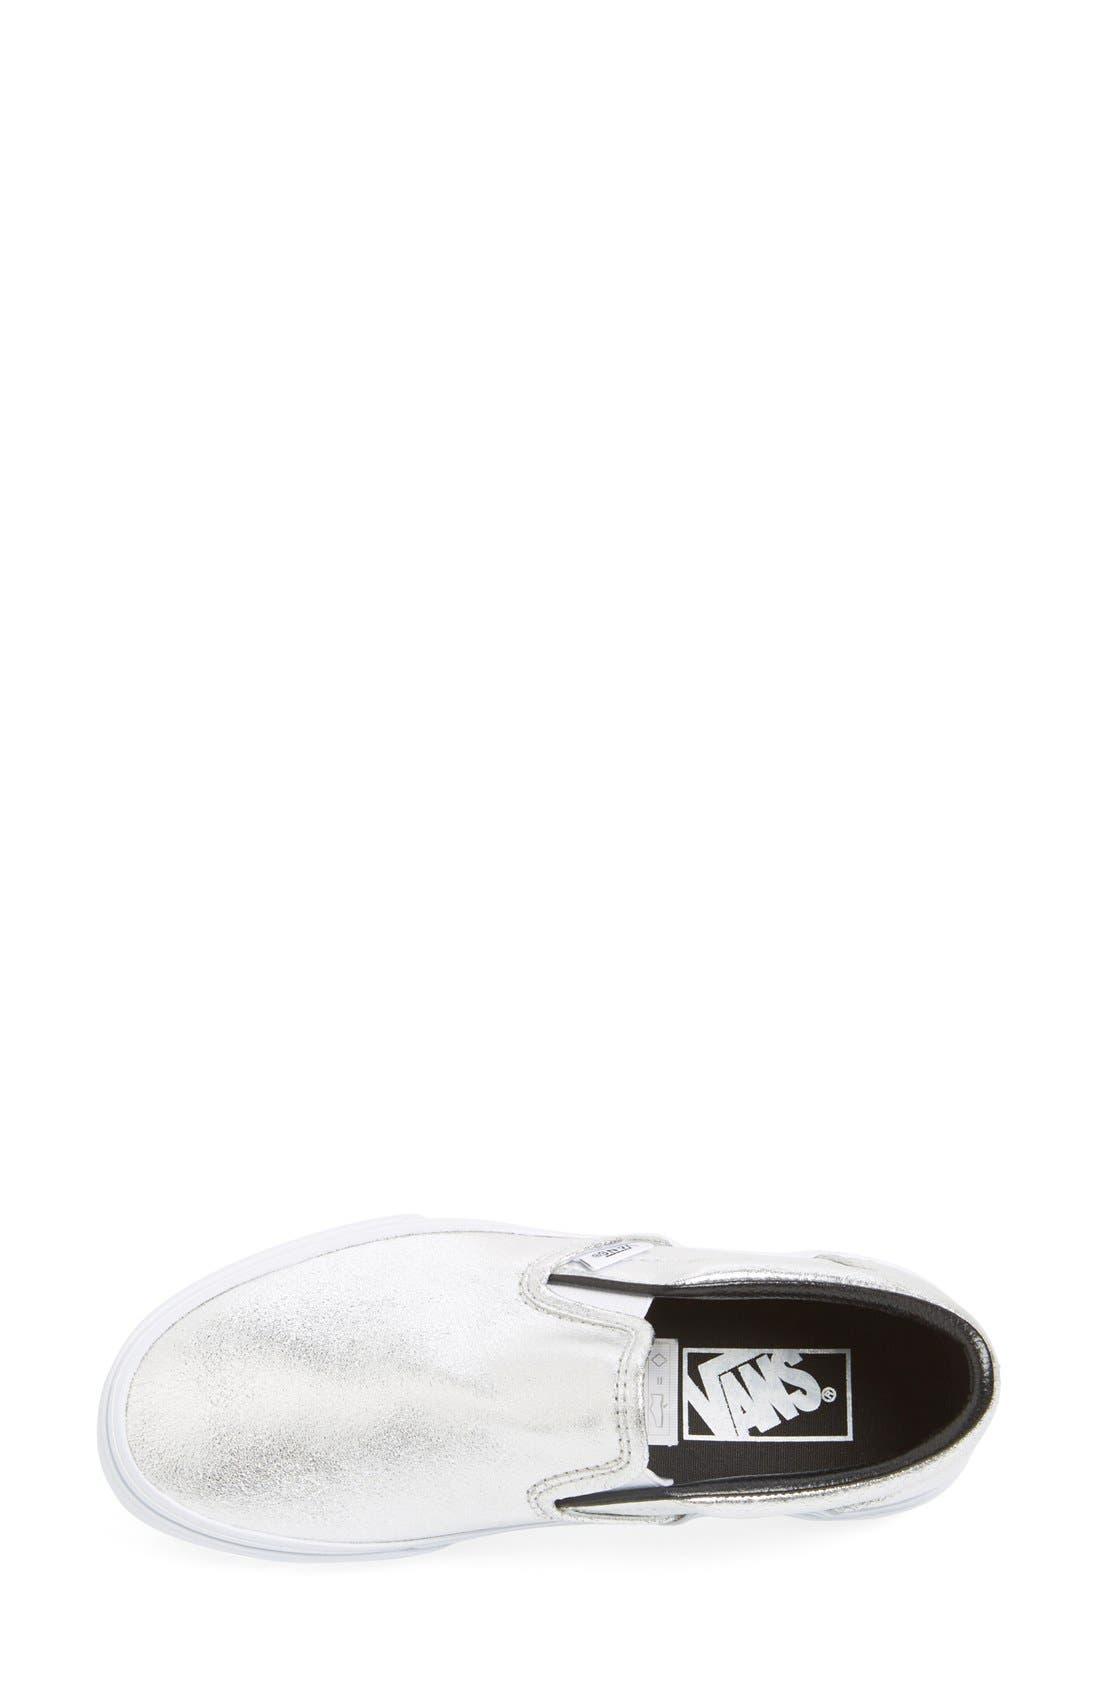 Alternate Image 3  - Vans Metallic Leather Slip-On Sneaker (Women)